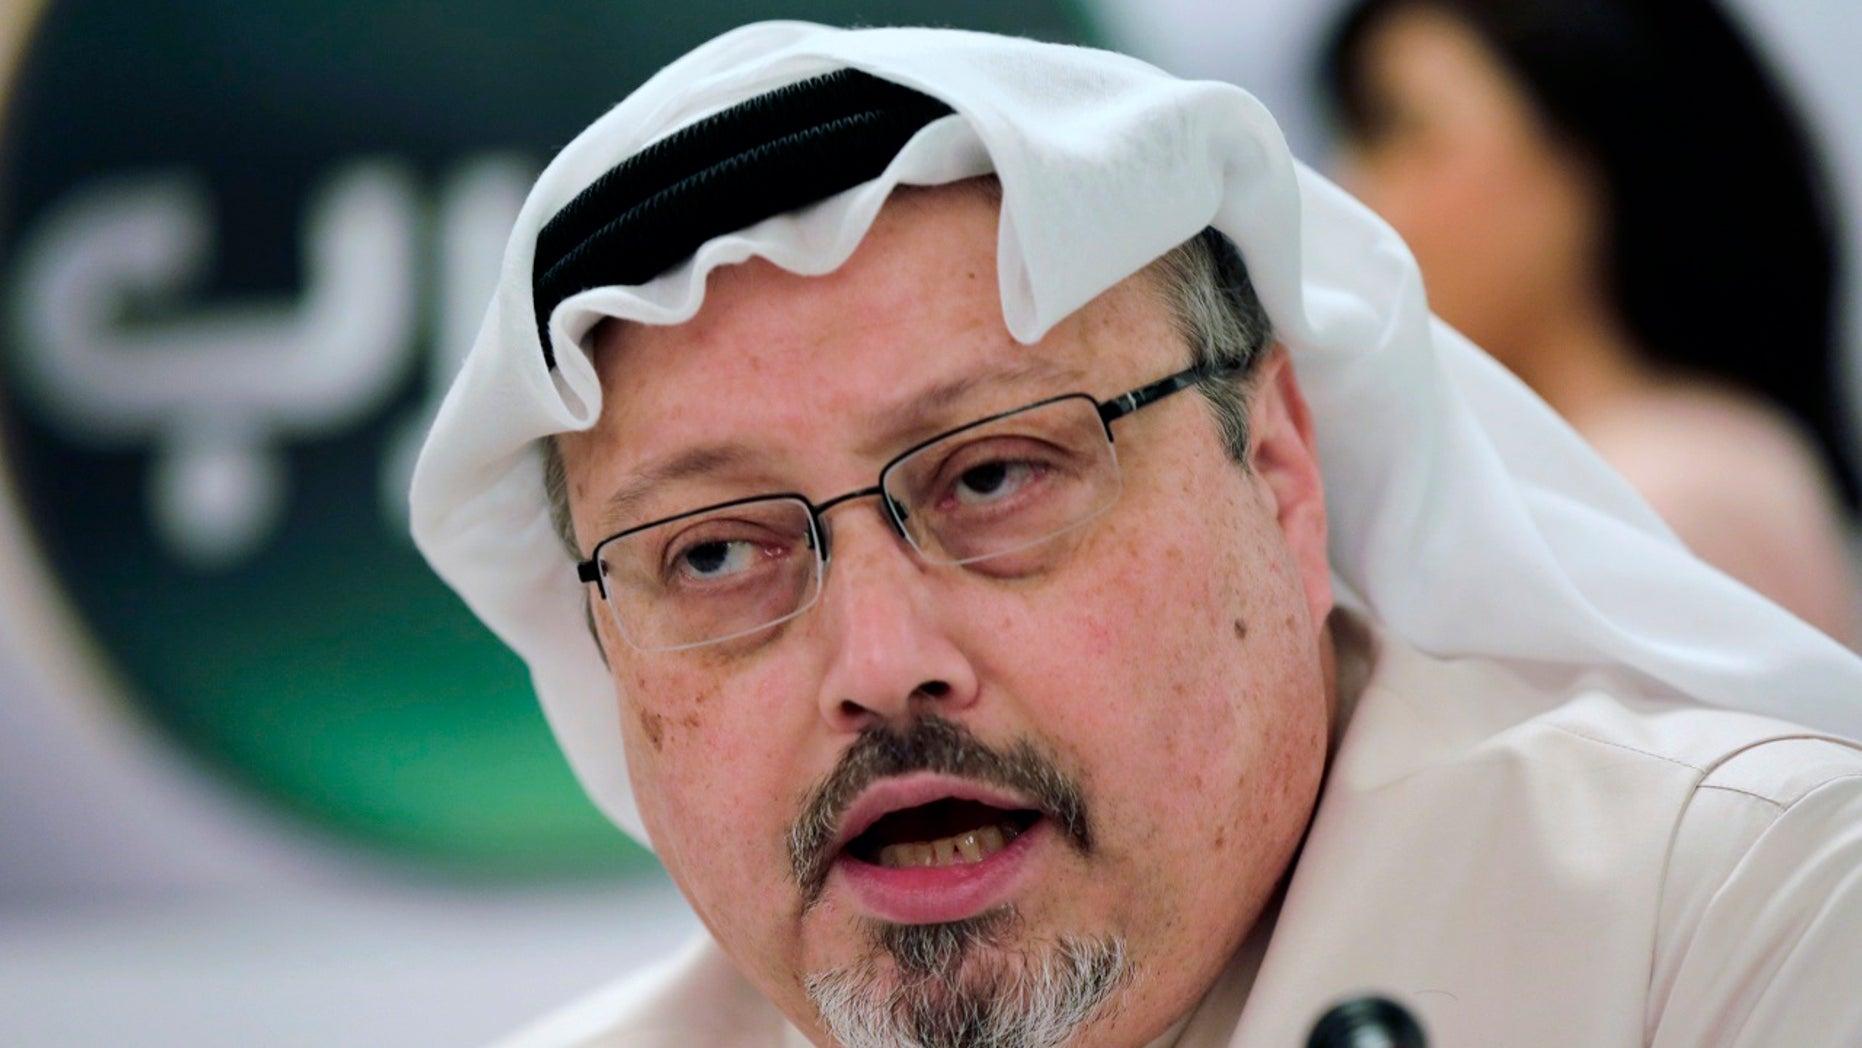 FILE - In this Feb. 1, 2015, file photo, Saudi journalist Jamal Khashoggi speaks during a press conference in Manama, Bahrain. (AP Photo/Hasan Jamali, File)